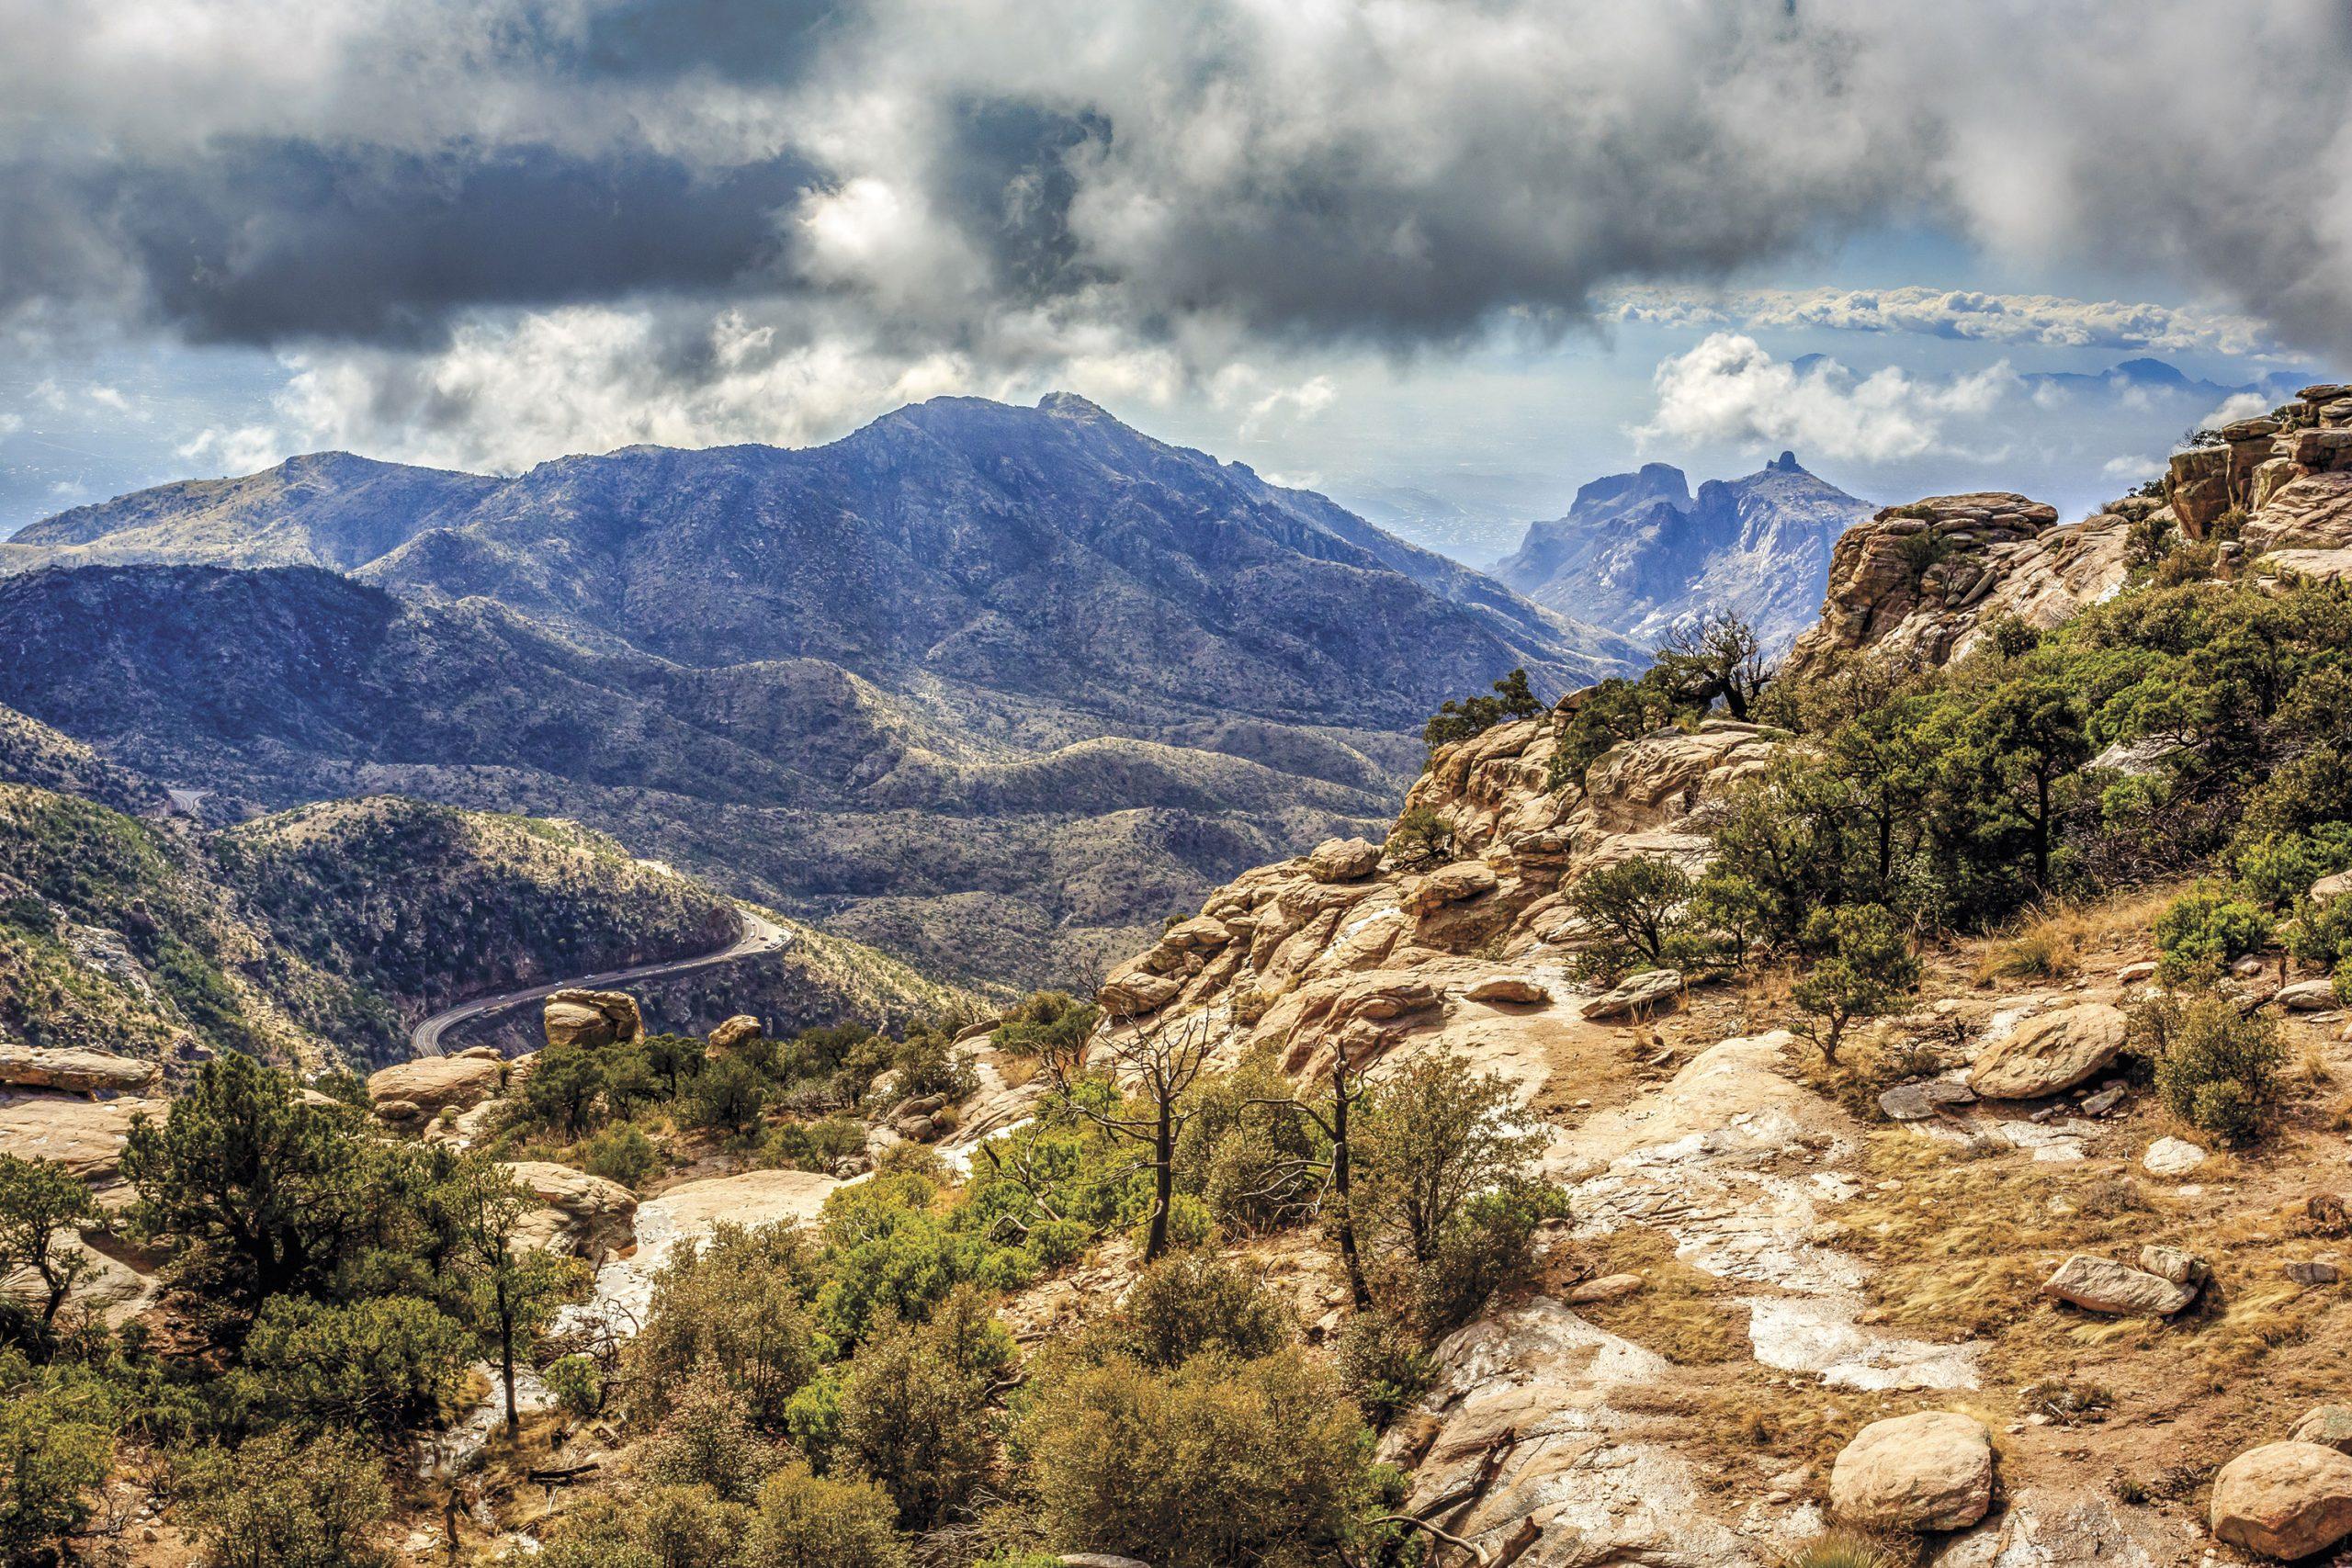 Scenic Catalina Highway on Mt. Lemmon; Photo courtesy Adobe Stock Images